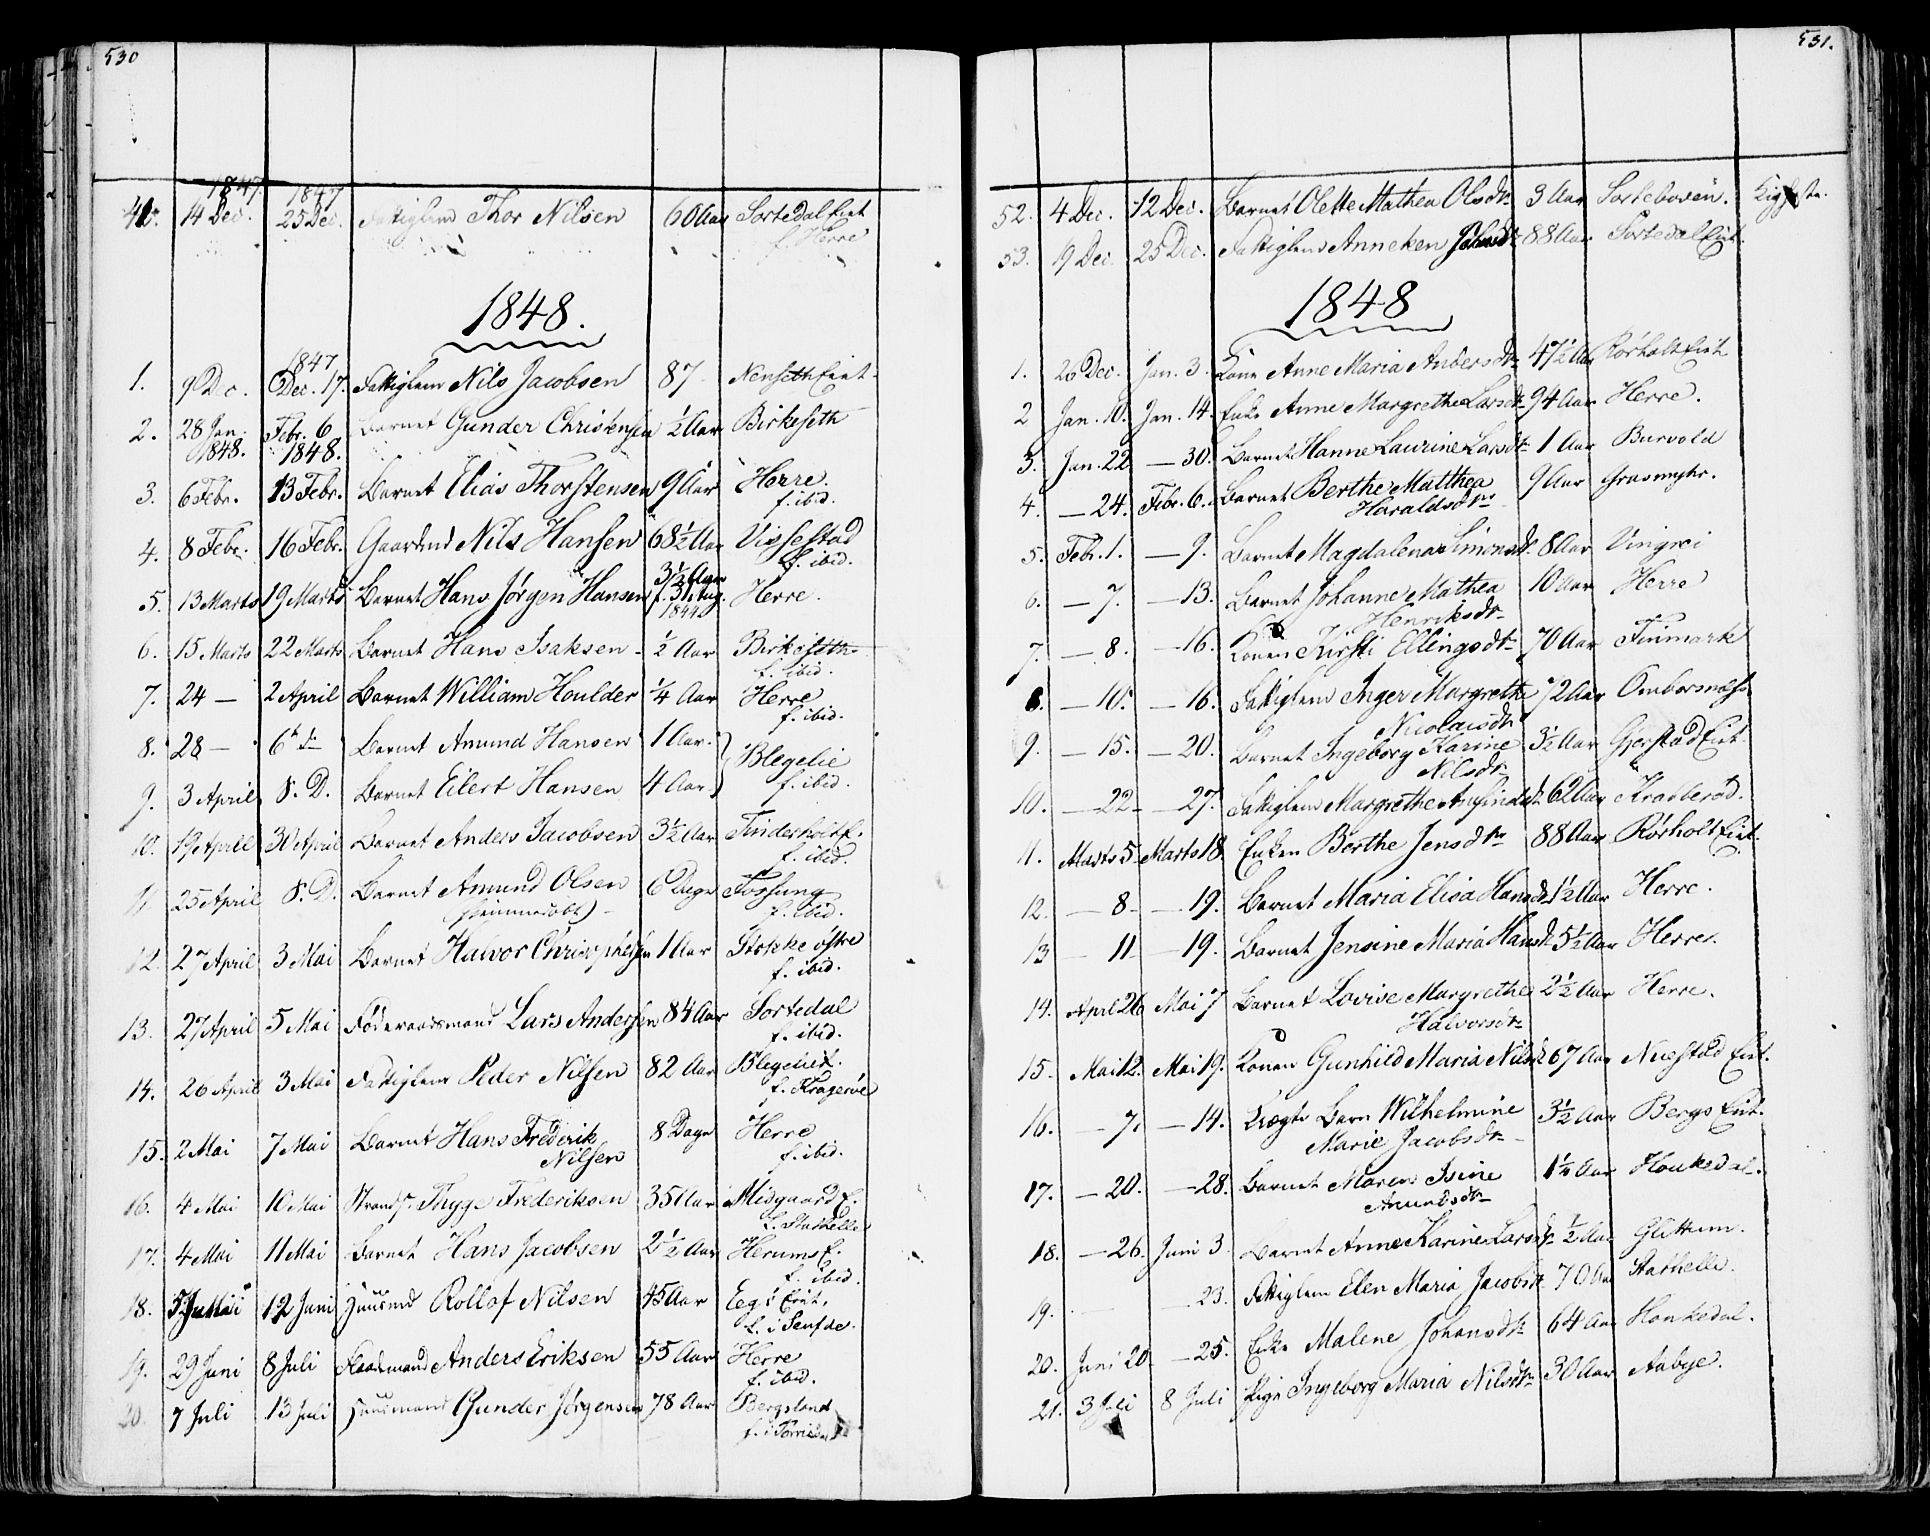 SAKO, Bamble kirkebøker, F/Fa/L0004: Ministerialbok nr. I 4, 1834-1853, s. 530-531